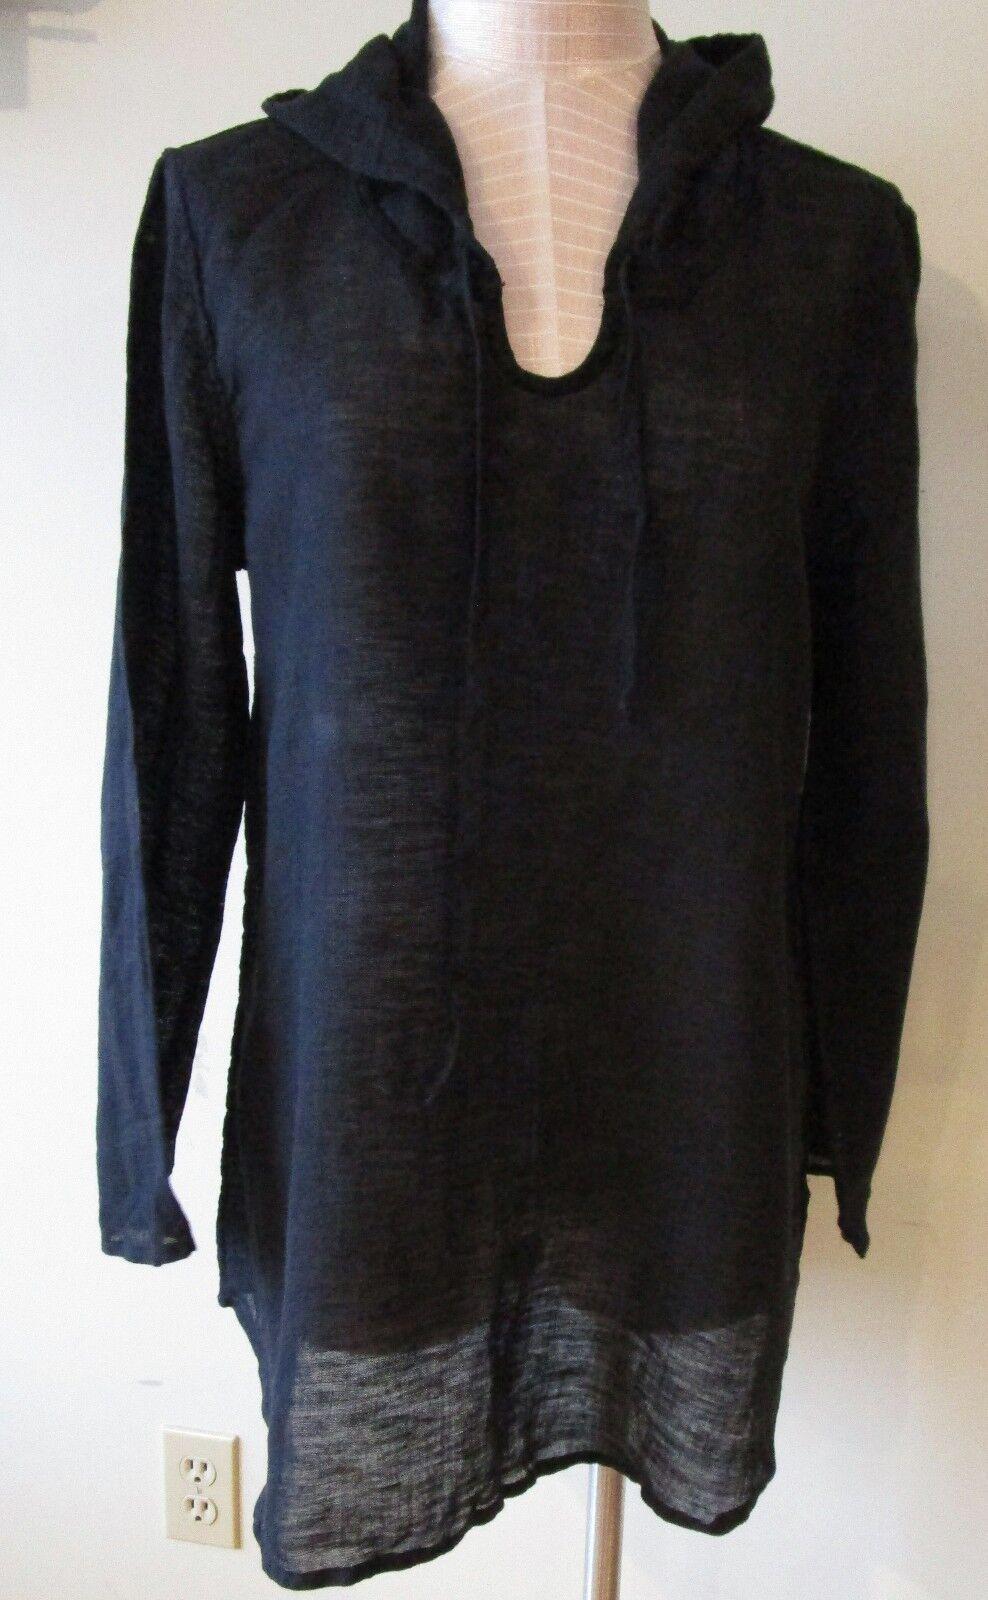 FLAX  Designs  LINEN Hoodie Tunic Shirt   S   &  L  NWOT  schwarz Voile